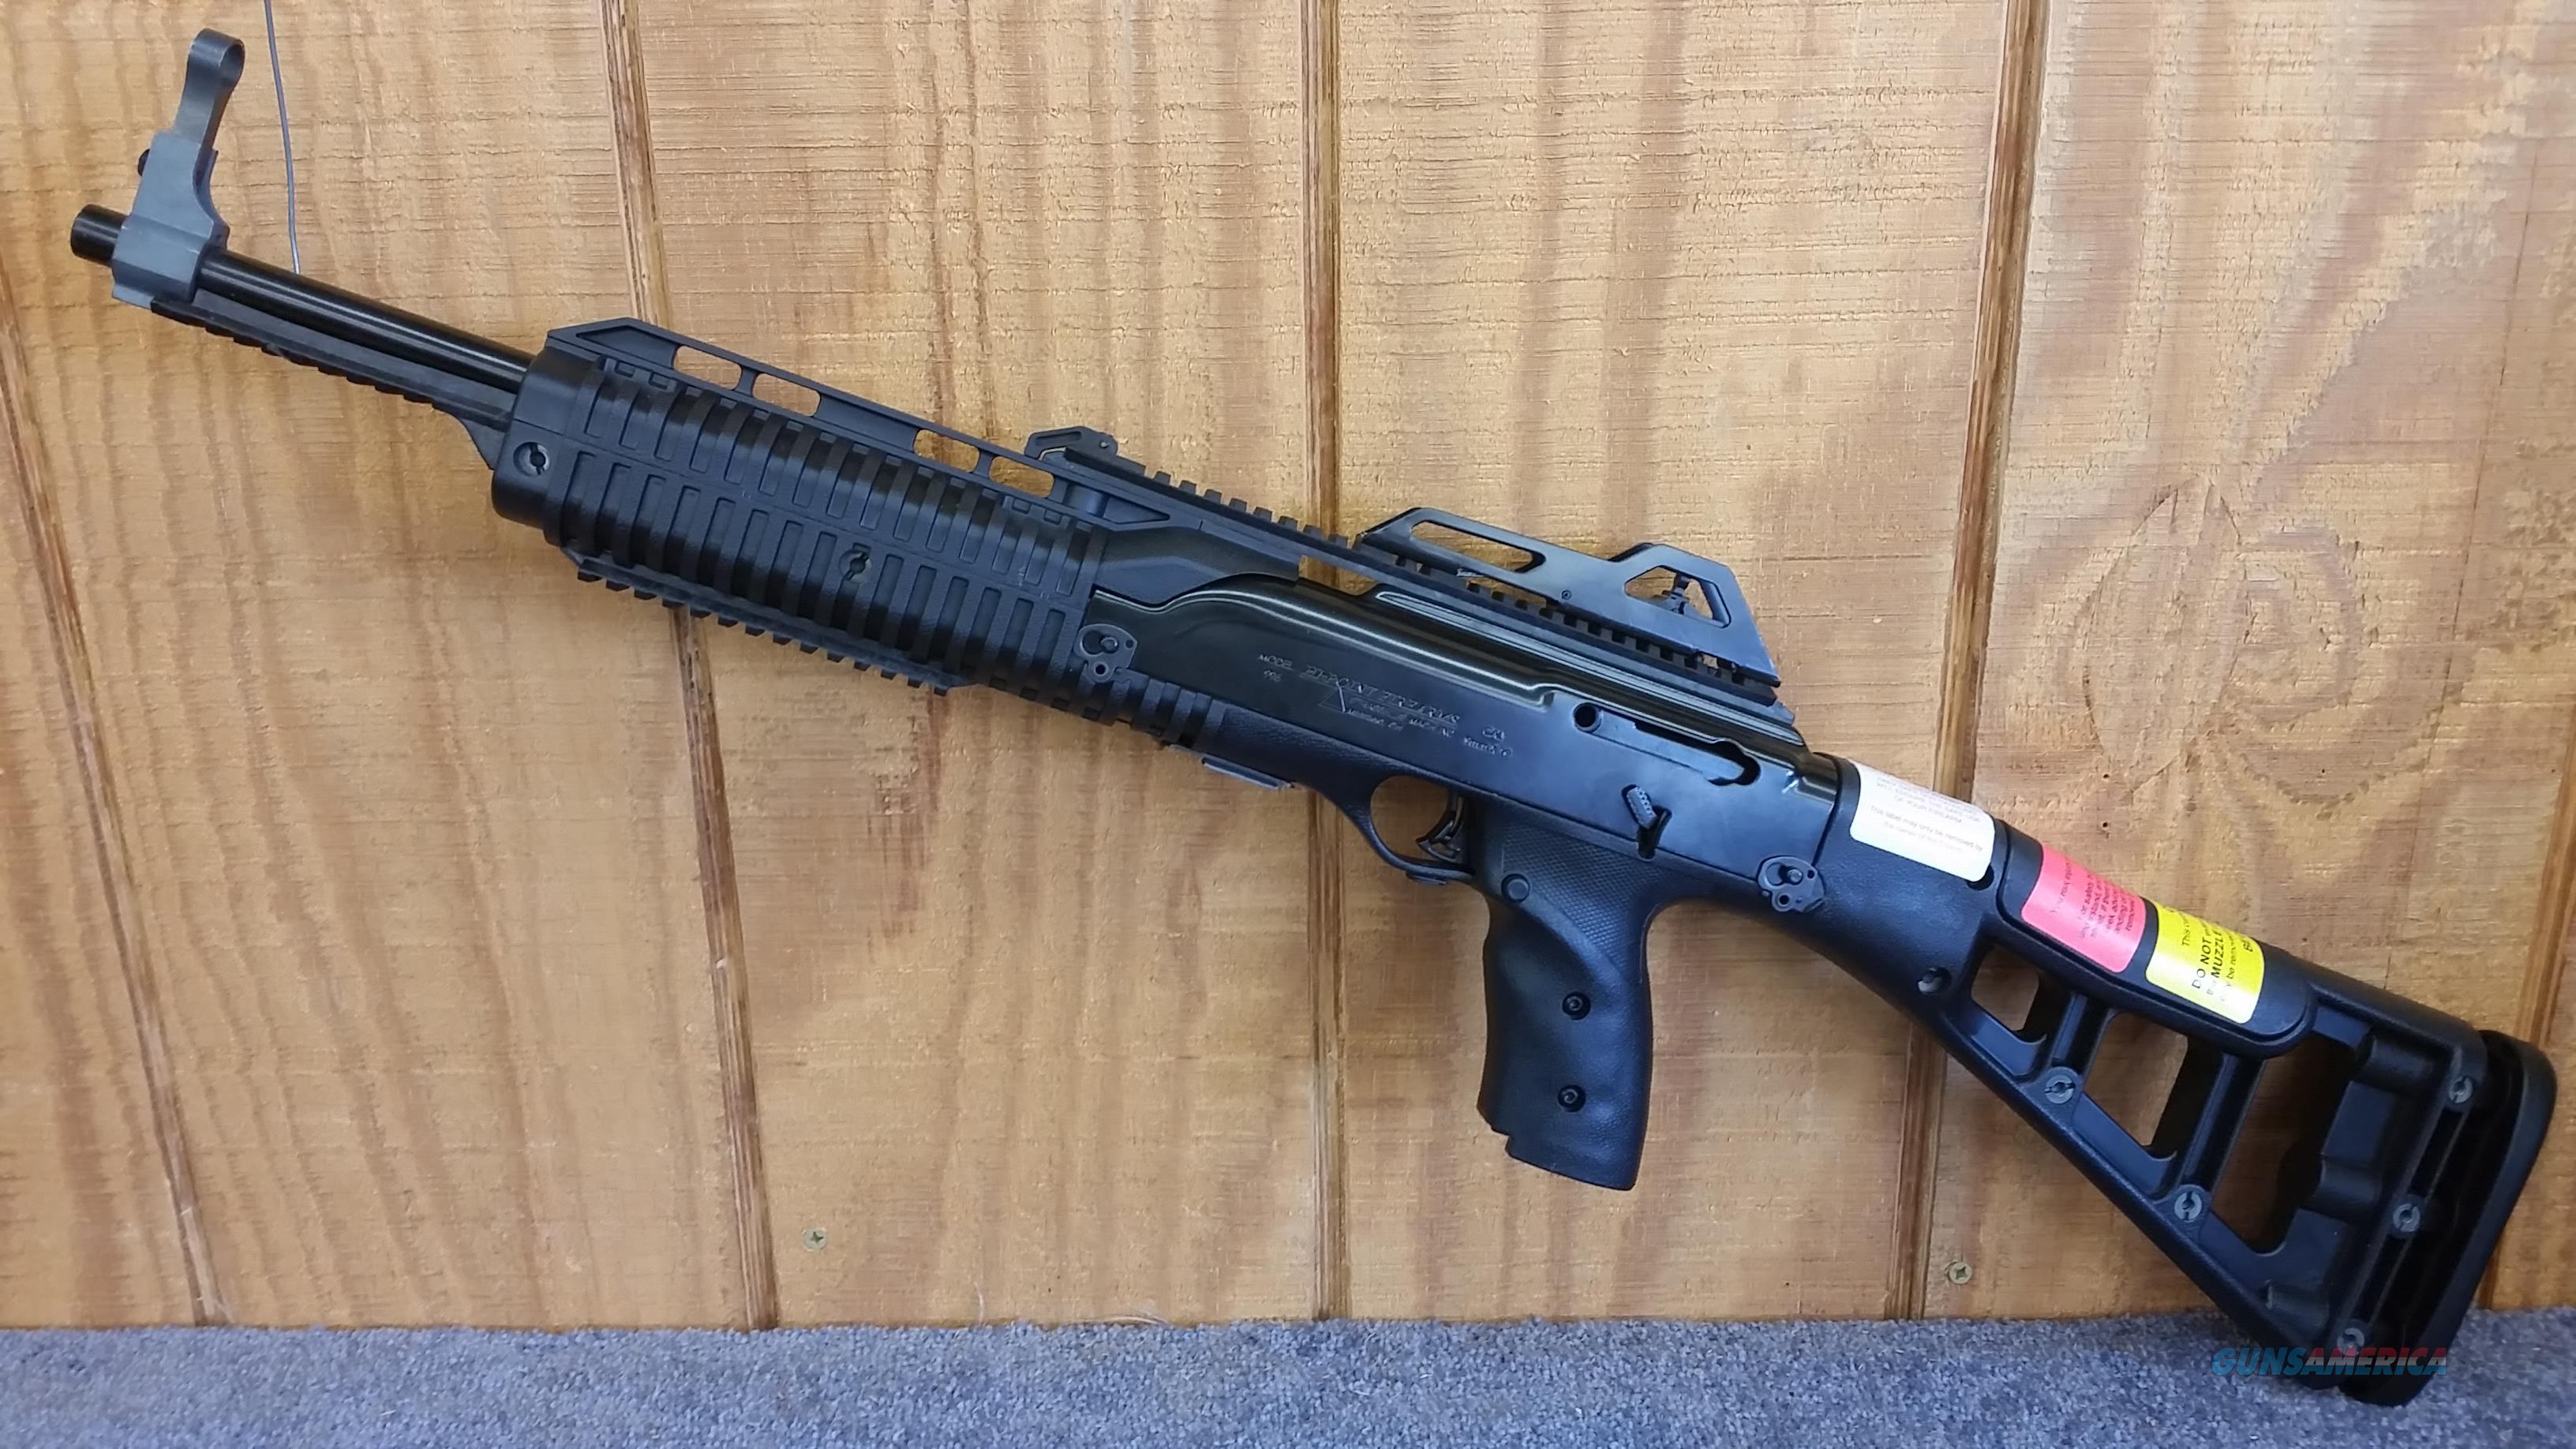 Hi-Point 995TS PRO Carbine 9mm w/ (2) 10 Round Mags and Forward Grip  Guns > Rifles > Hi Point Rifles